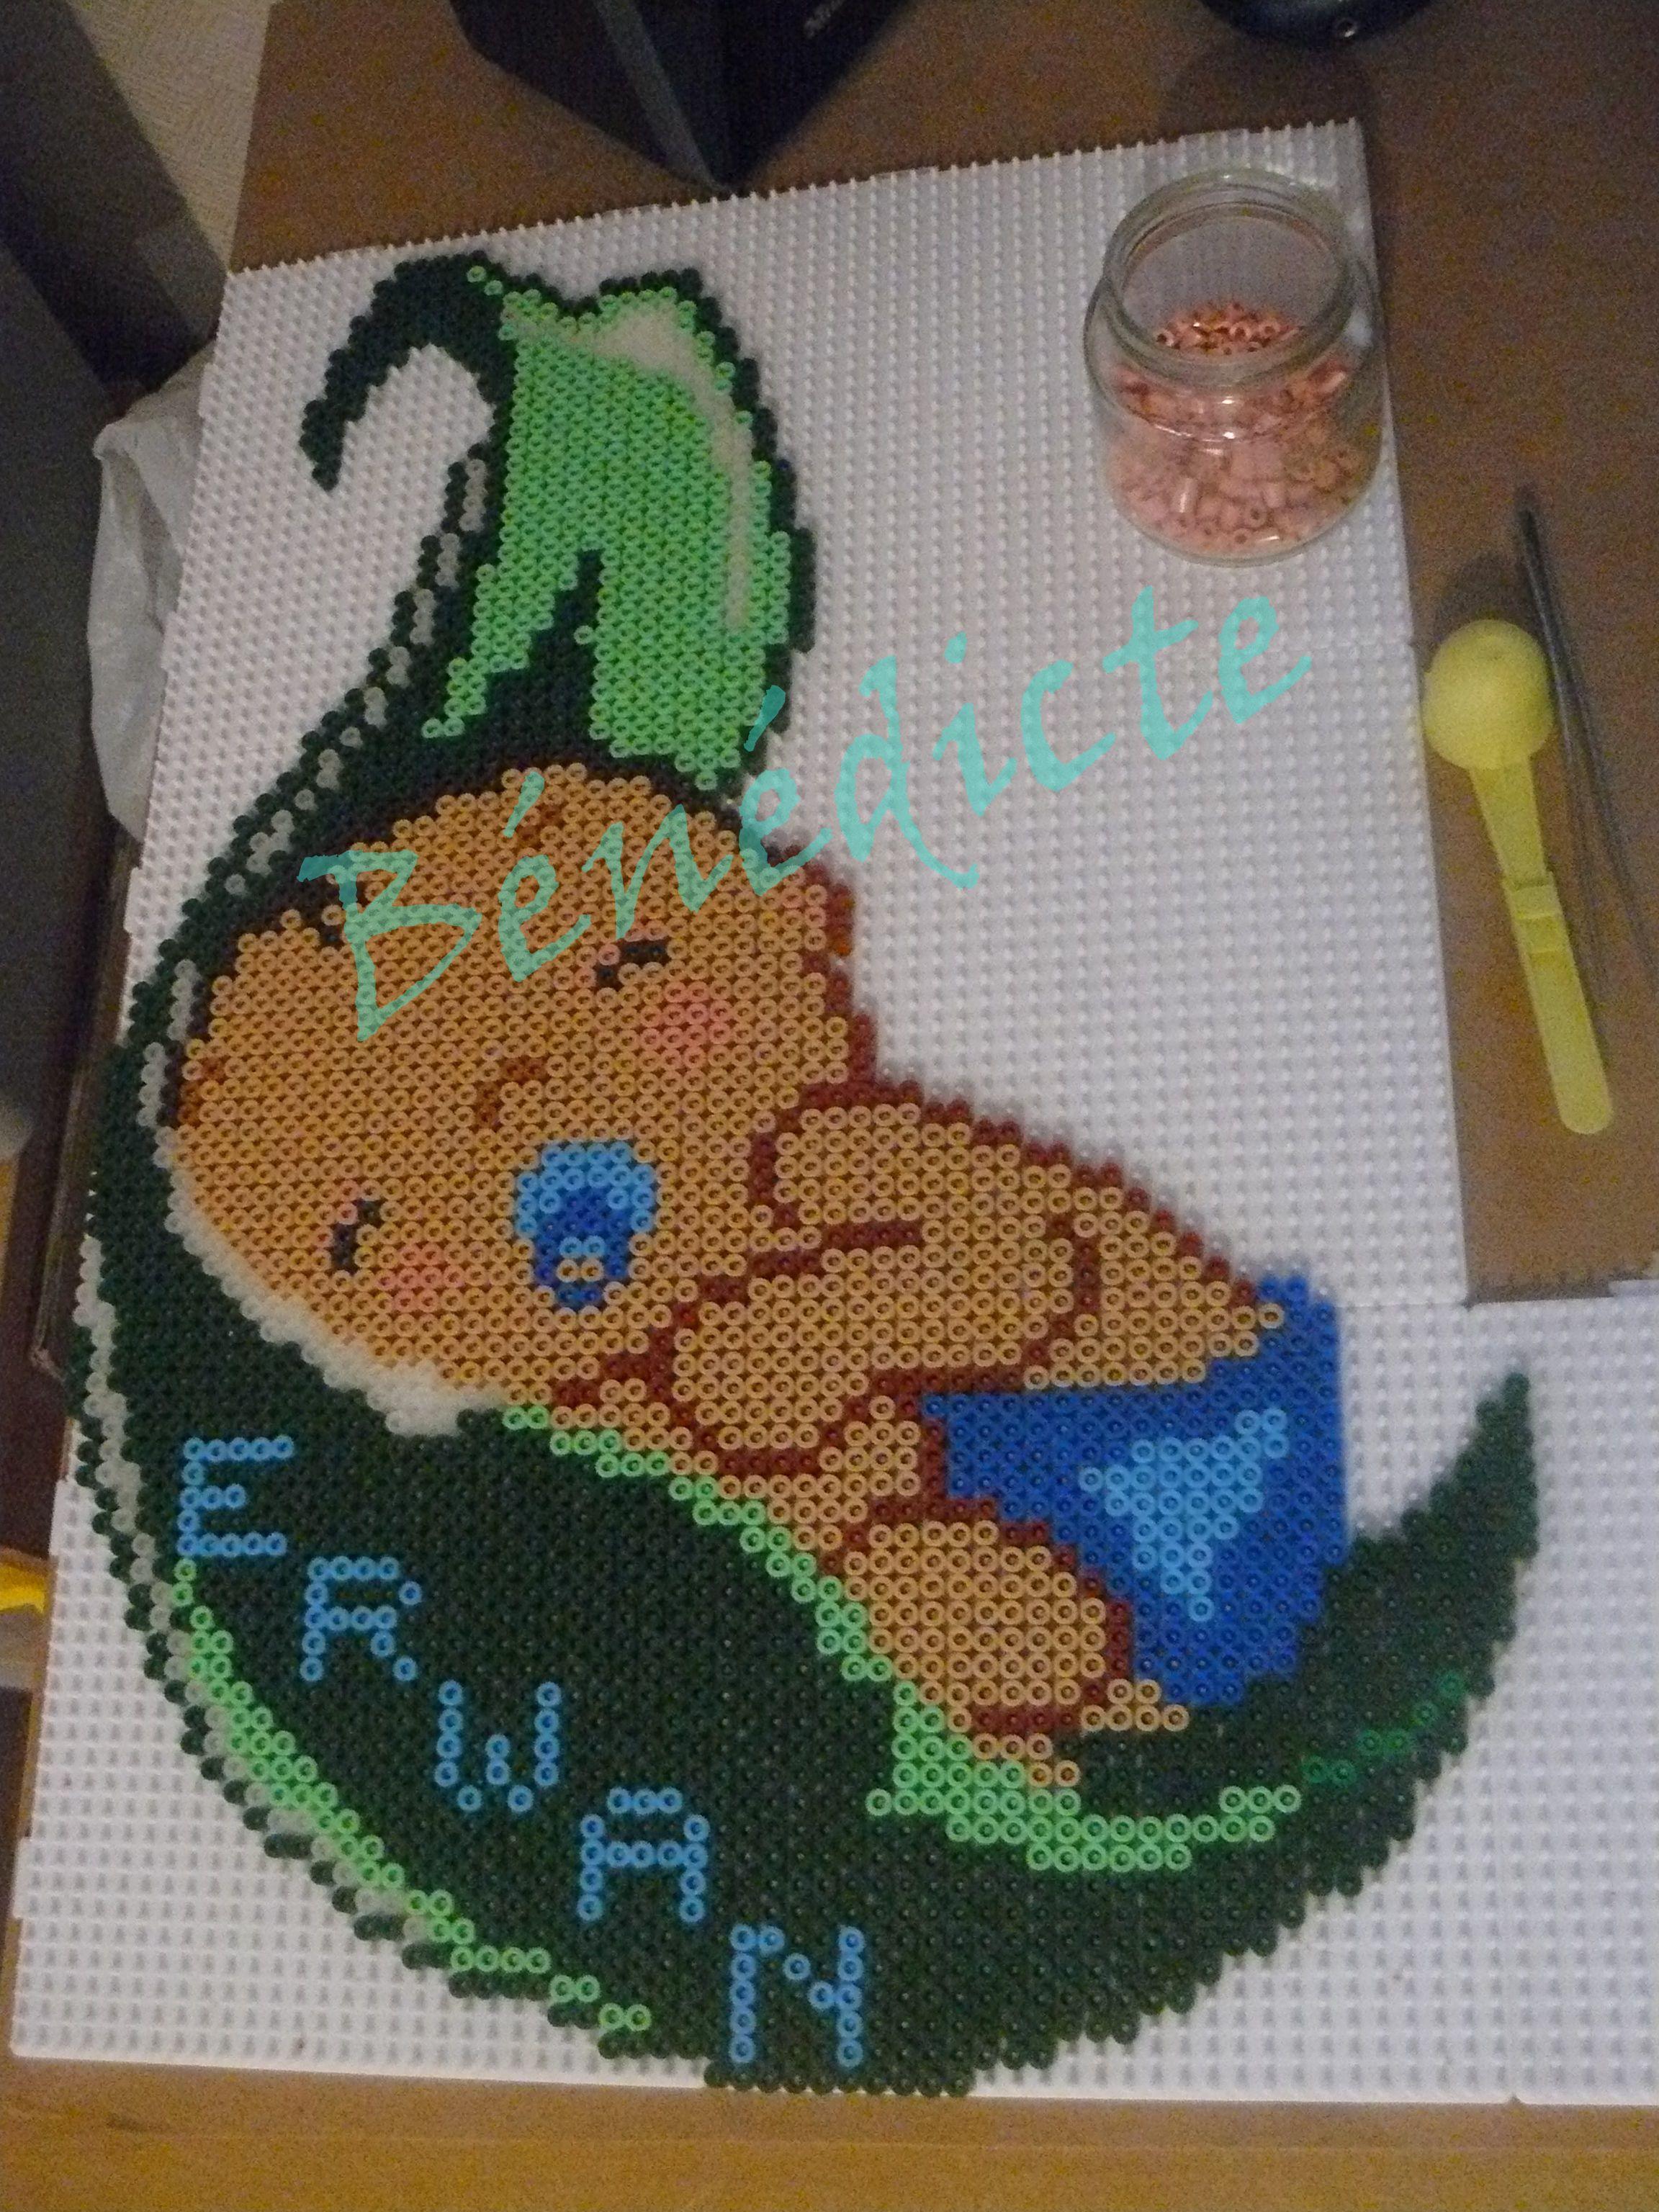 Custom baby perler art hama beads by Bénédicte Lambert - Pattern: https://www.pinterest.com/pin/374291419007120437/